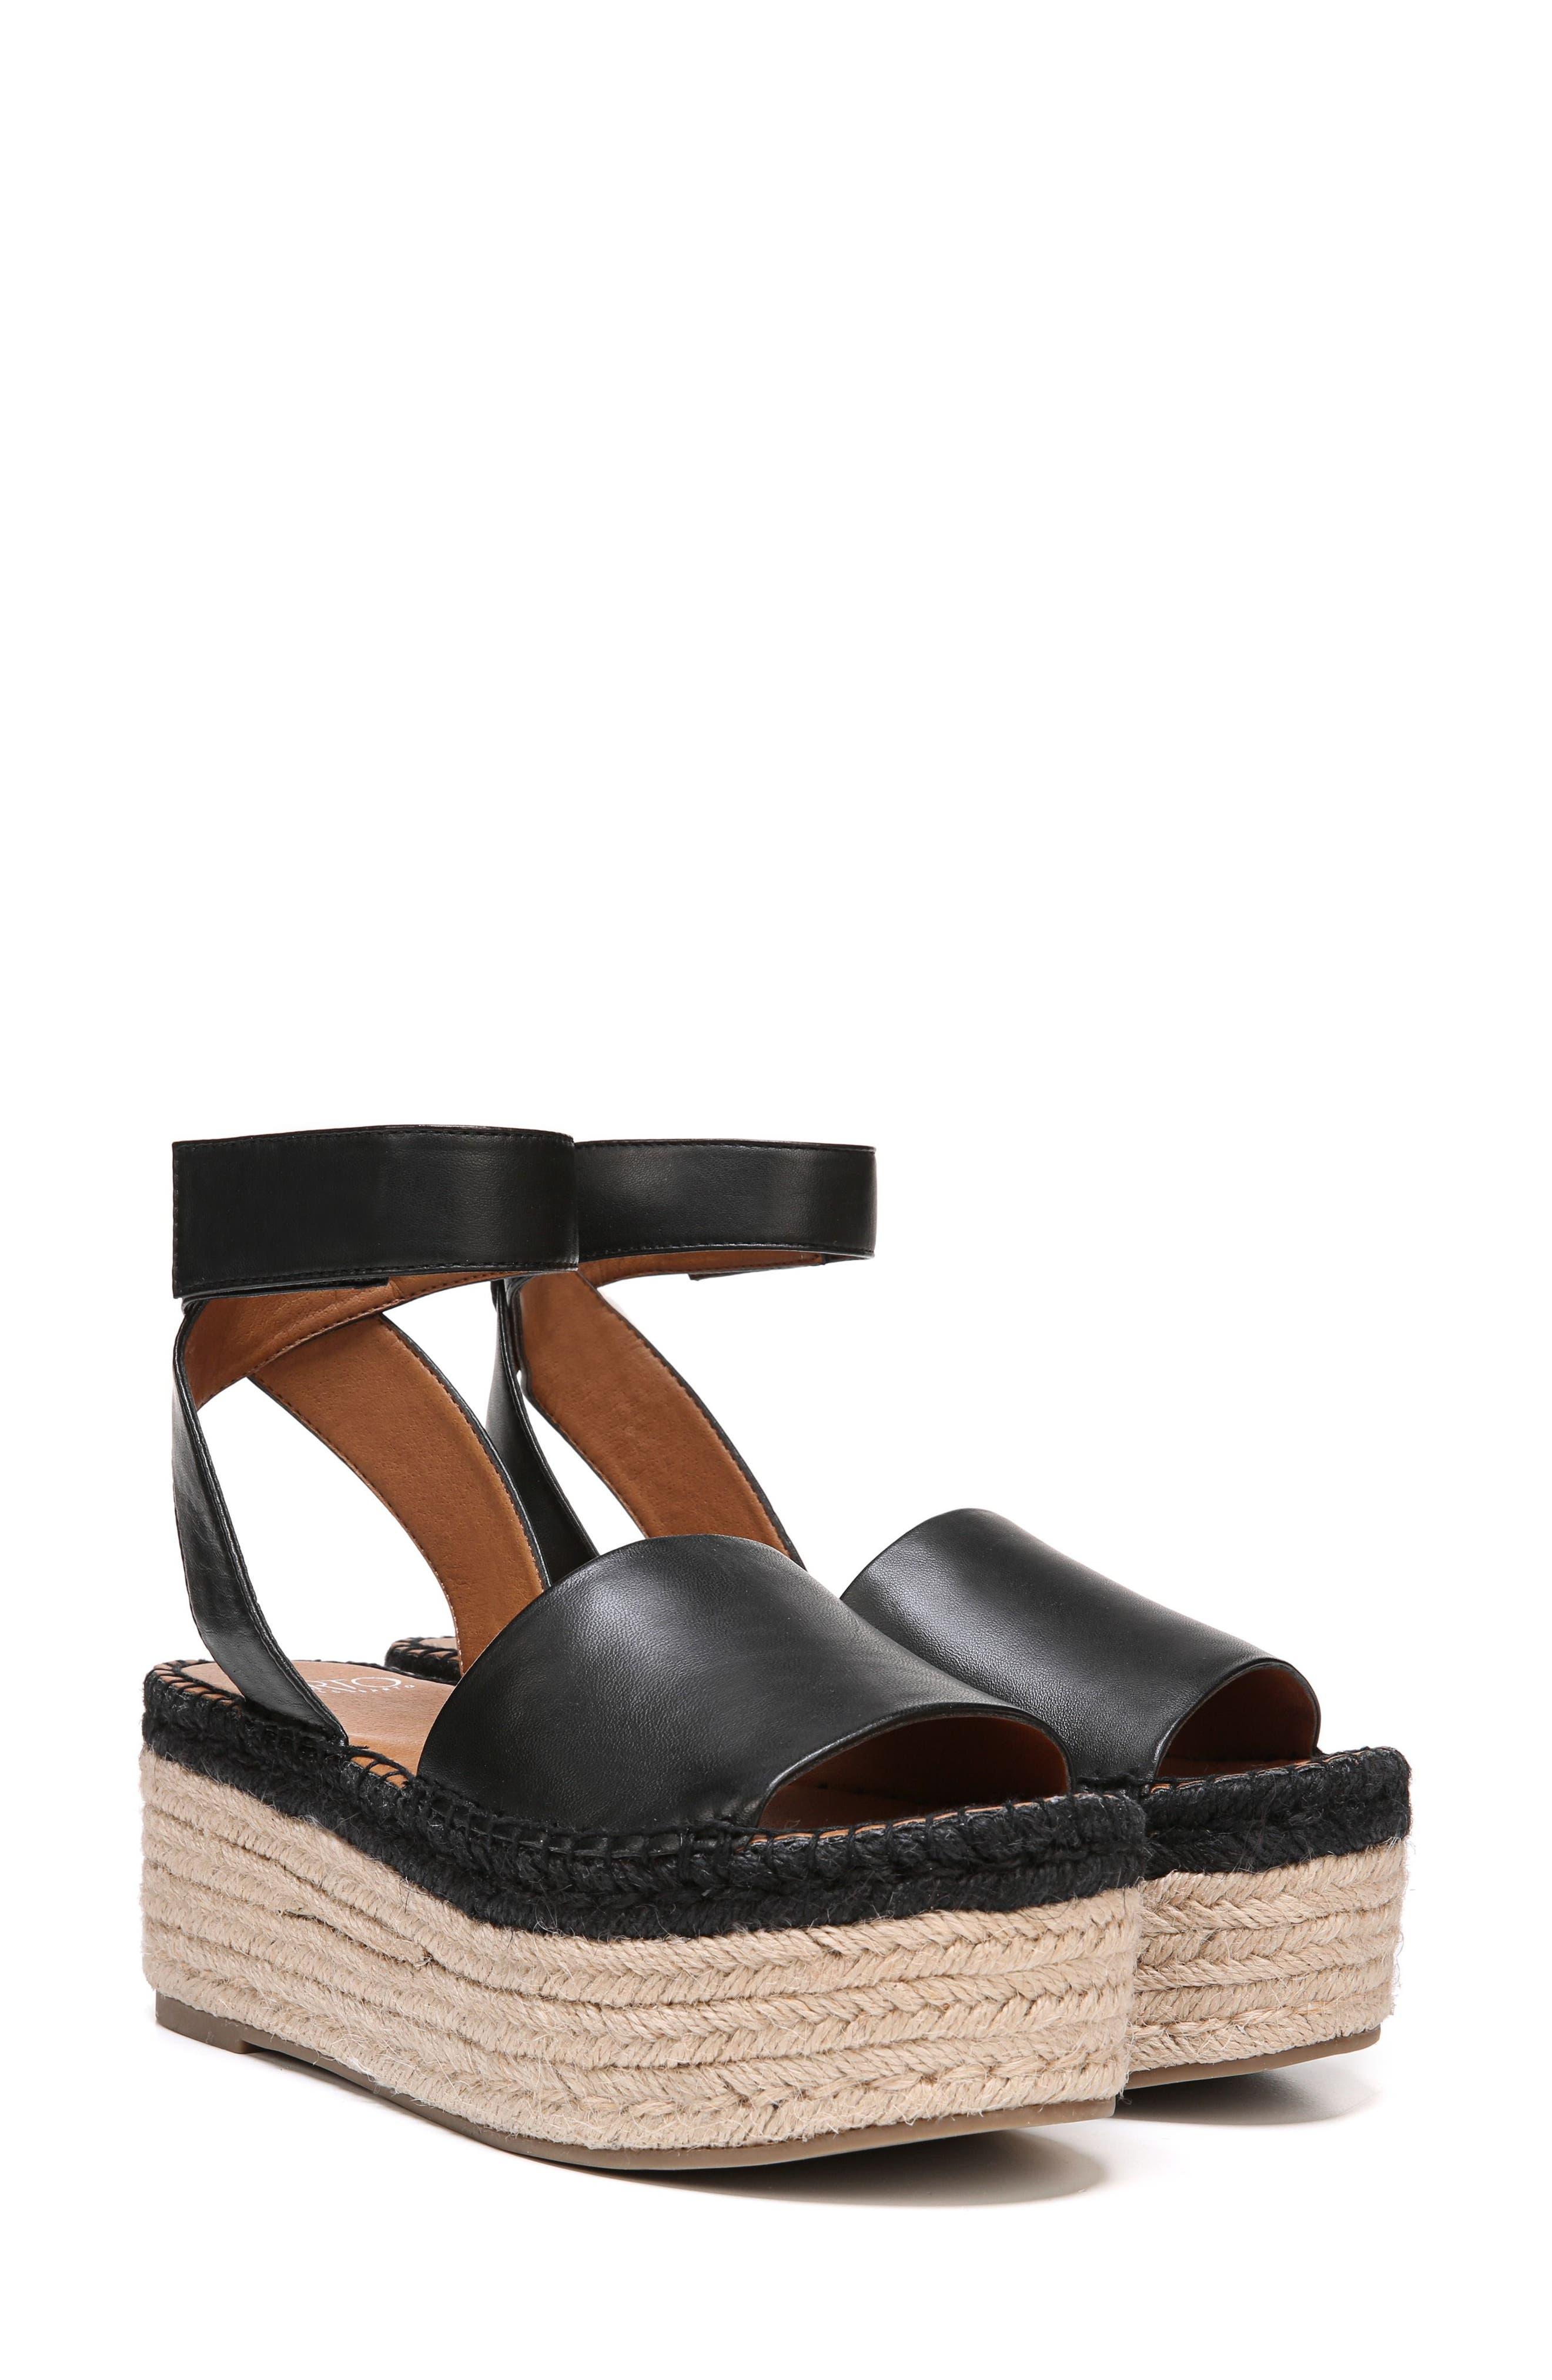 Maisi Platform Espadrille Sandal,                             Alternate thumbnail 8, color,                             BLACK LEATHER